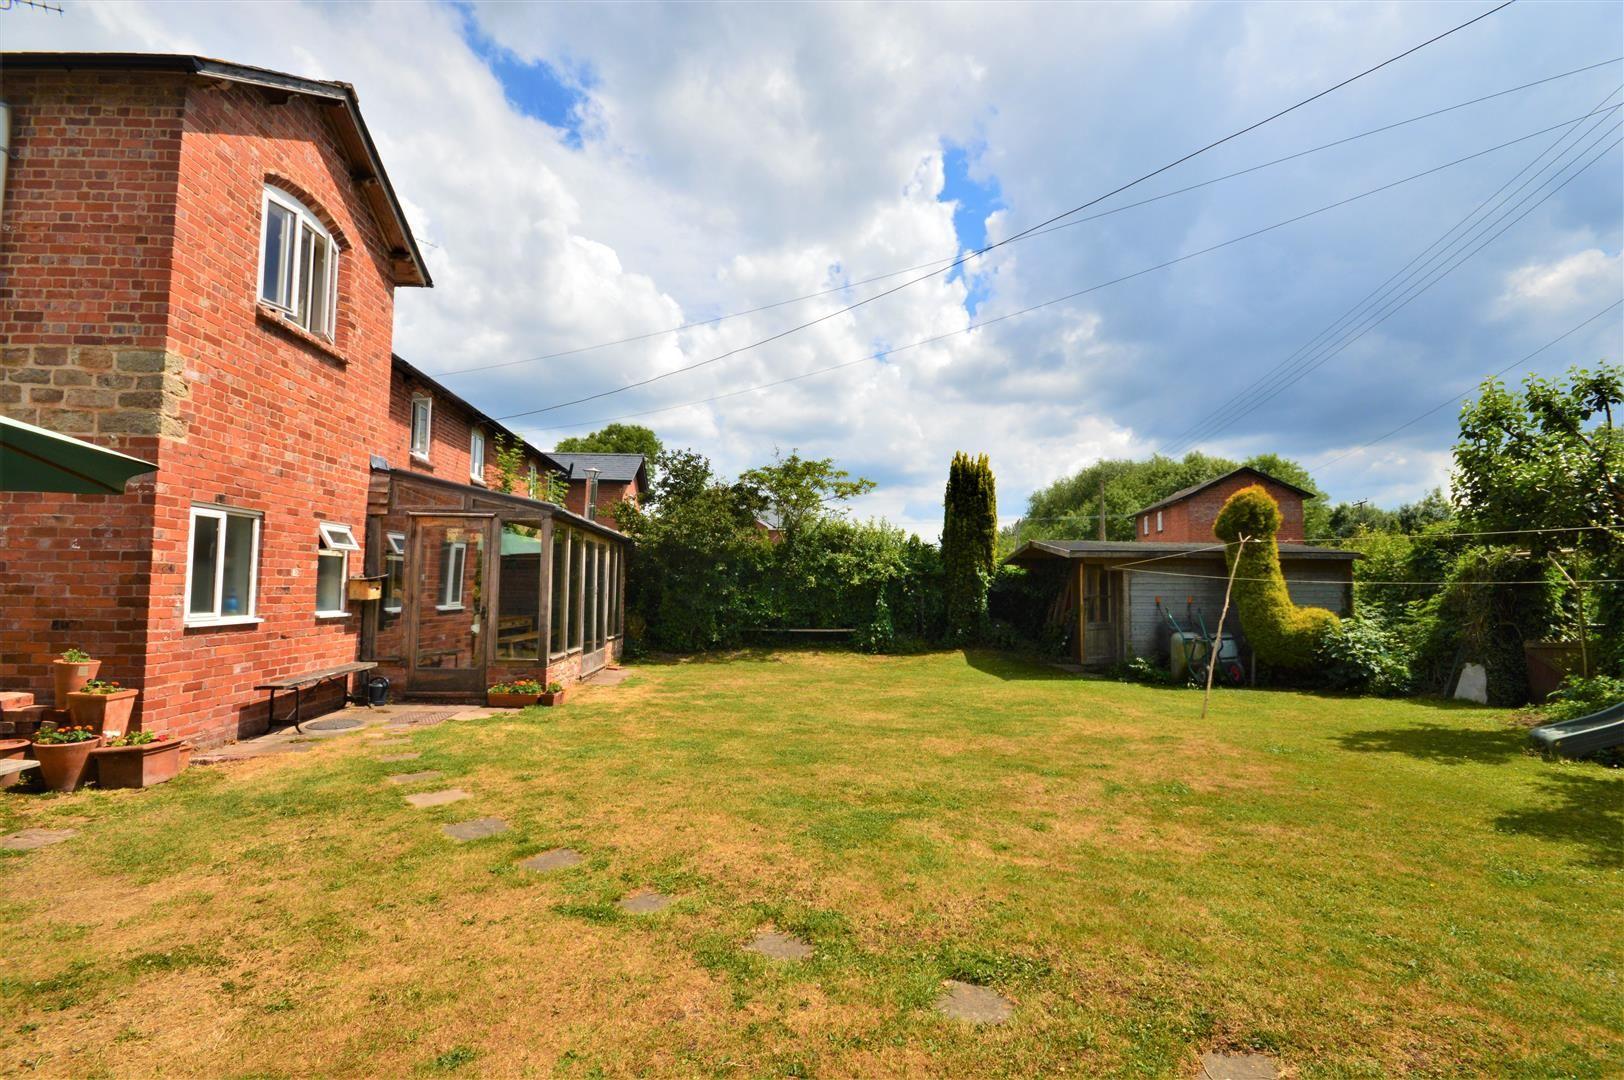 3 bed cottage for sale in Cross Keys - Property Image 1